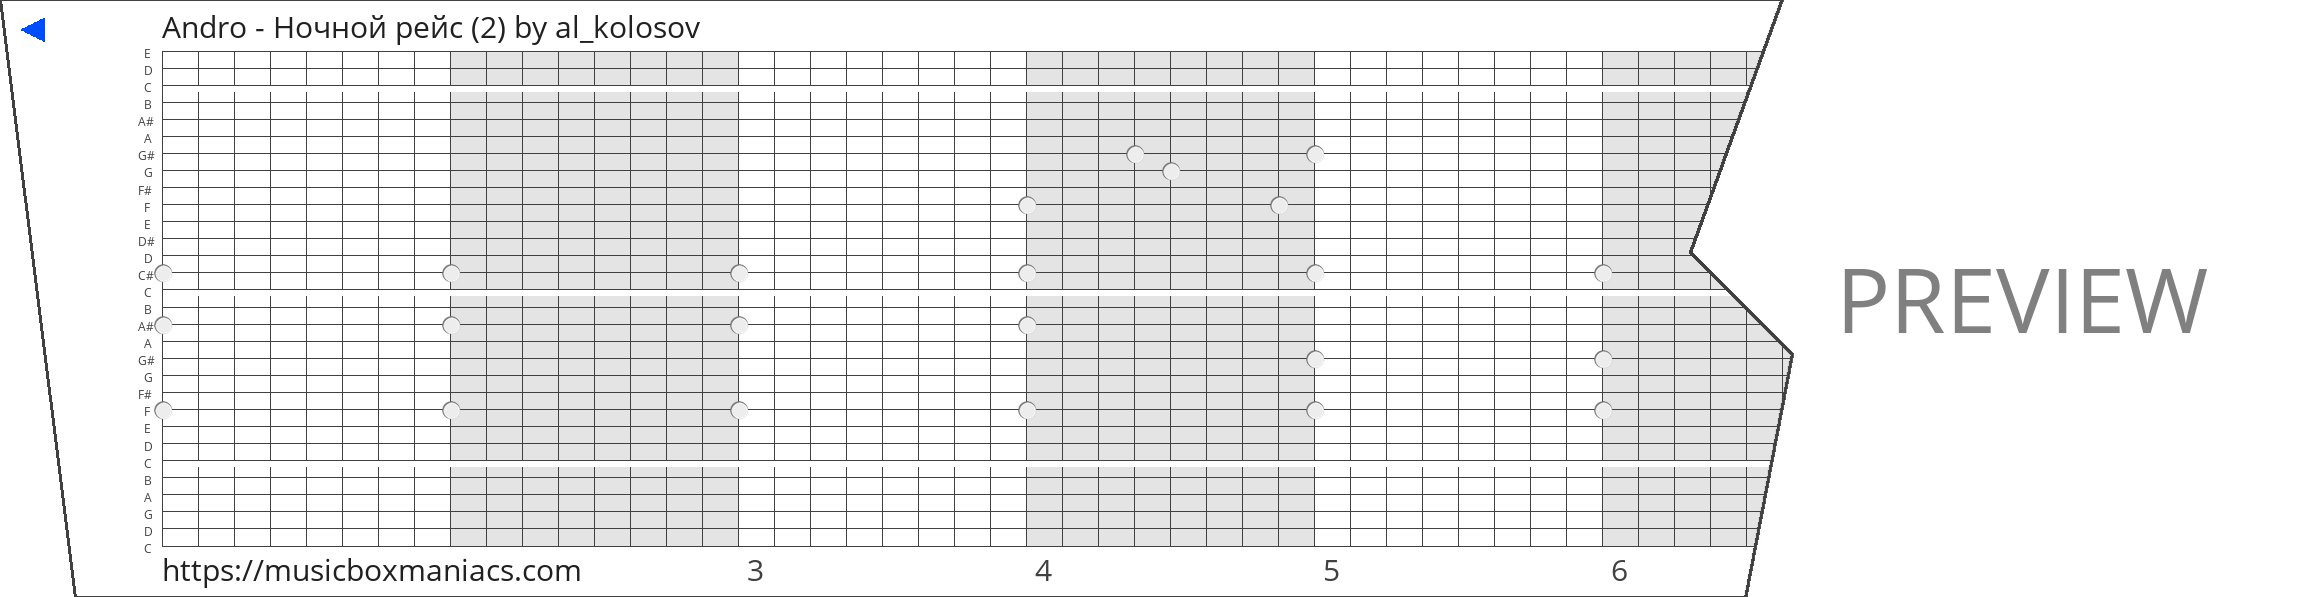 Andro - Ночной рейс (2) 30 note music box paper strip